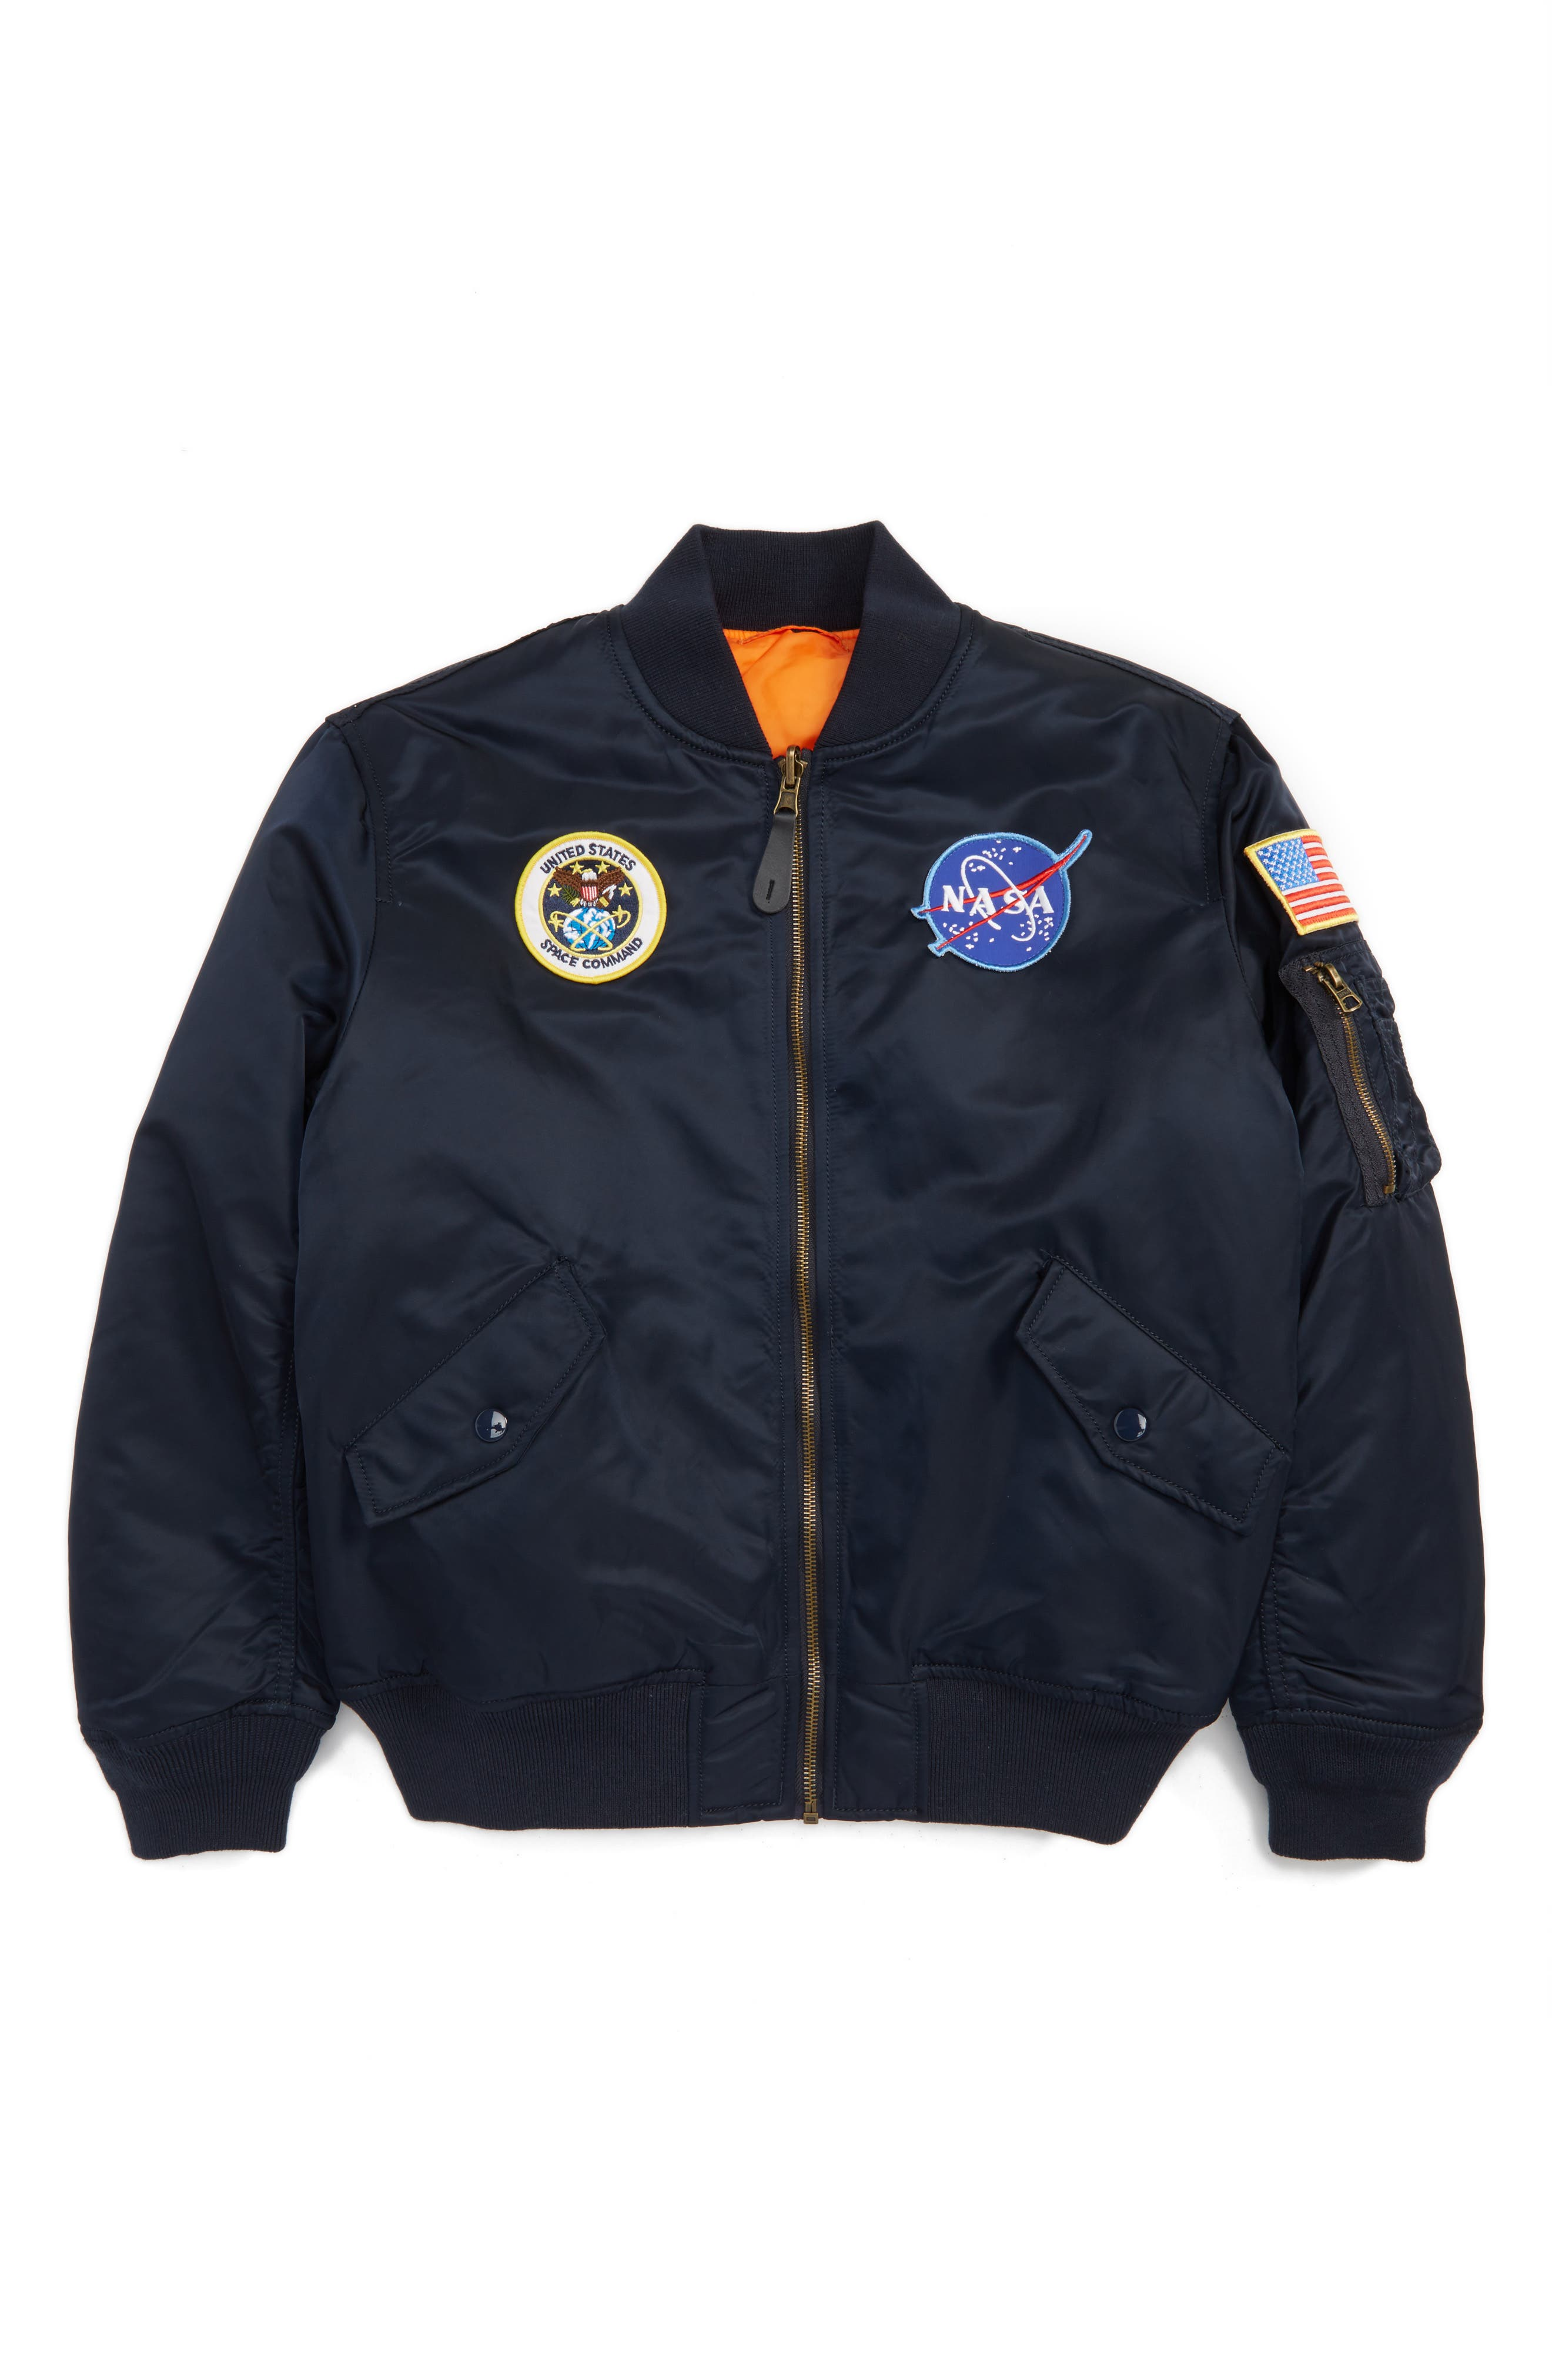 MA-1 Nasa Flight Jacket,                         Main,                         color, Replica Blue